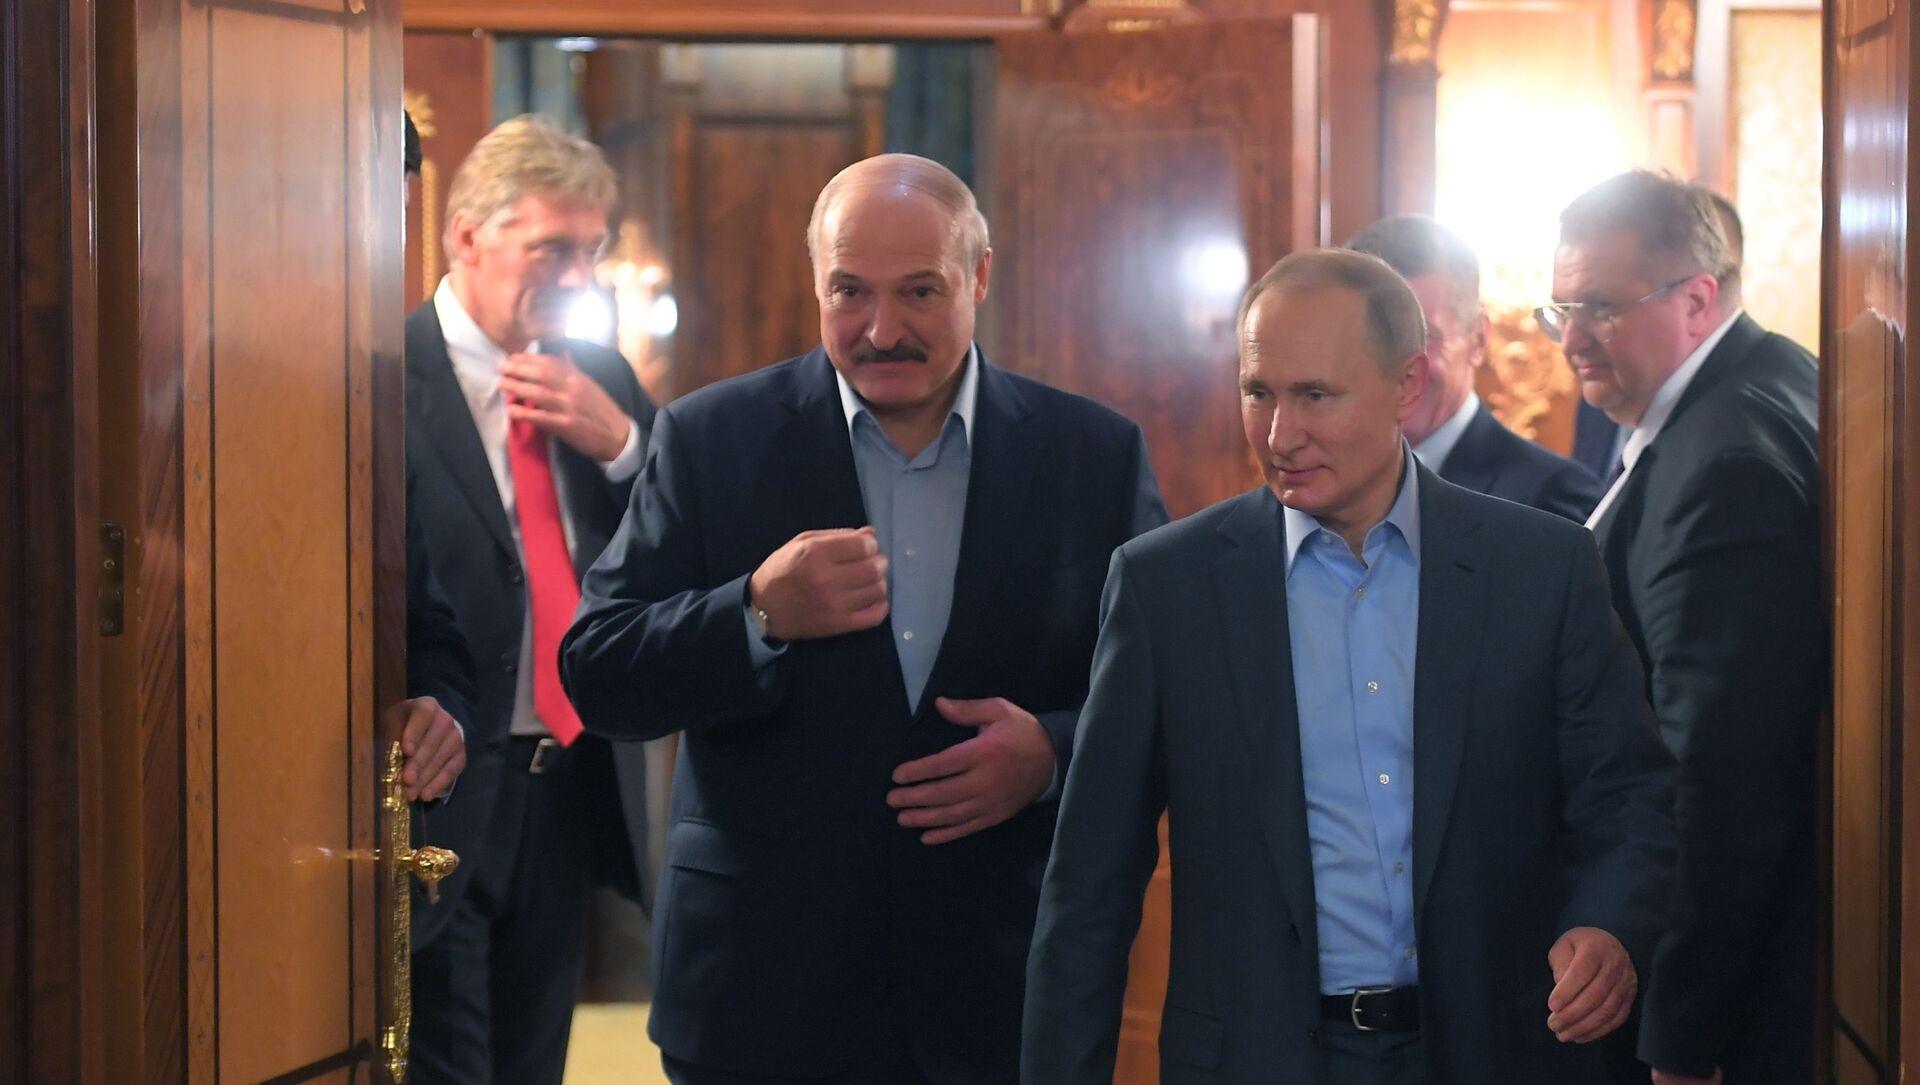 Президент Белоруссии Александр Лукашенко и президент РФ Владимир Путин во время встречи в Сочи - Sputnik Азербайджан, 1920, 09.09.2021